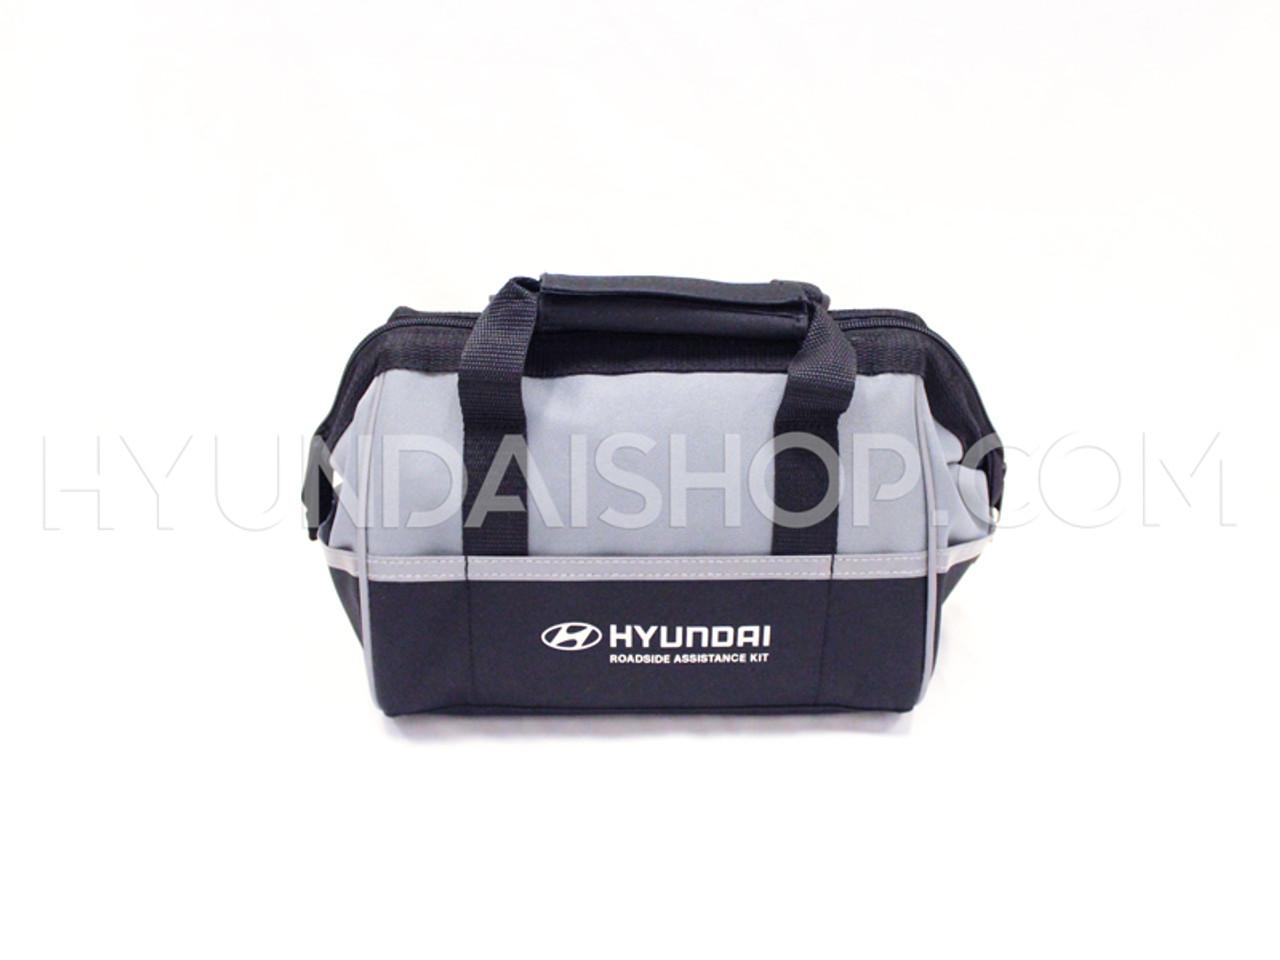 Hyundai Roadside Emergency Kit